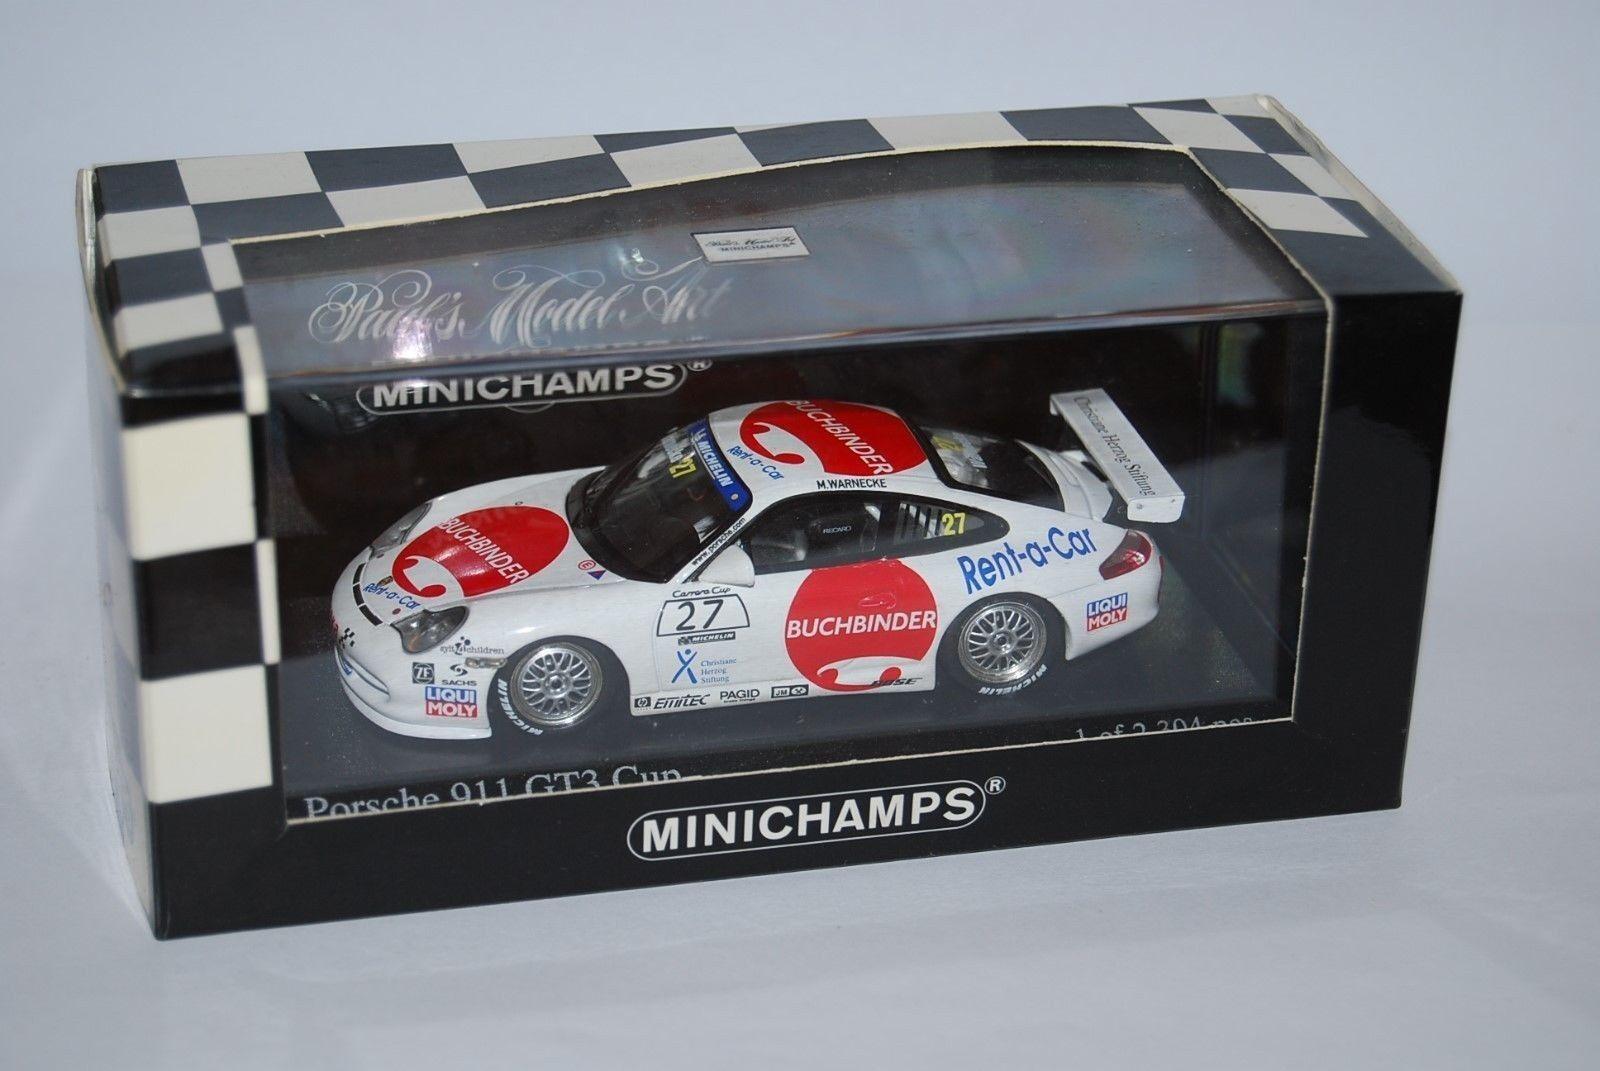 MINICHAMPS PORSCHE 911 GT3 CARRERA CUP 2004 400046227 NEUF BOITE NEW BOX 1 43